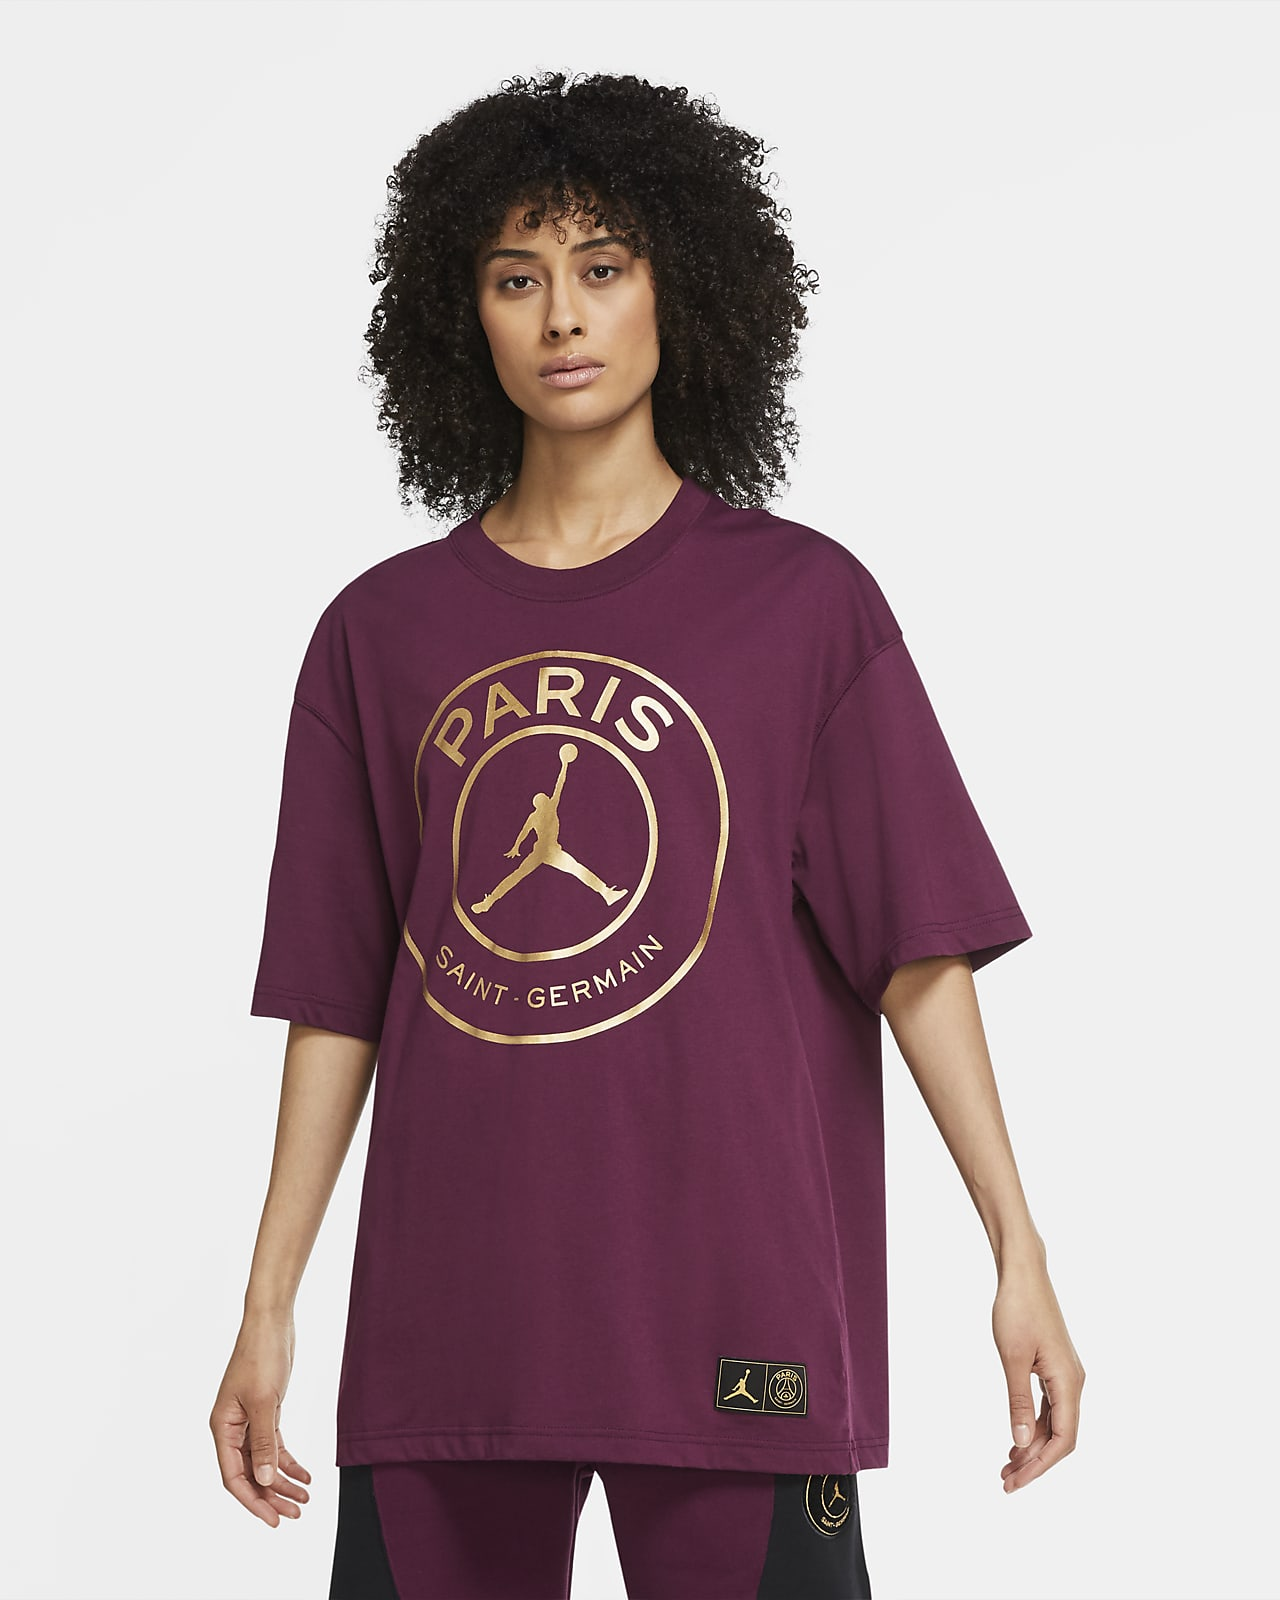 Paris Saint-Germain extragroßes Damen-T-Shirt